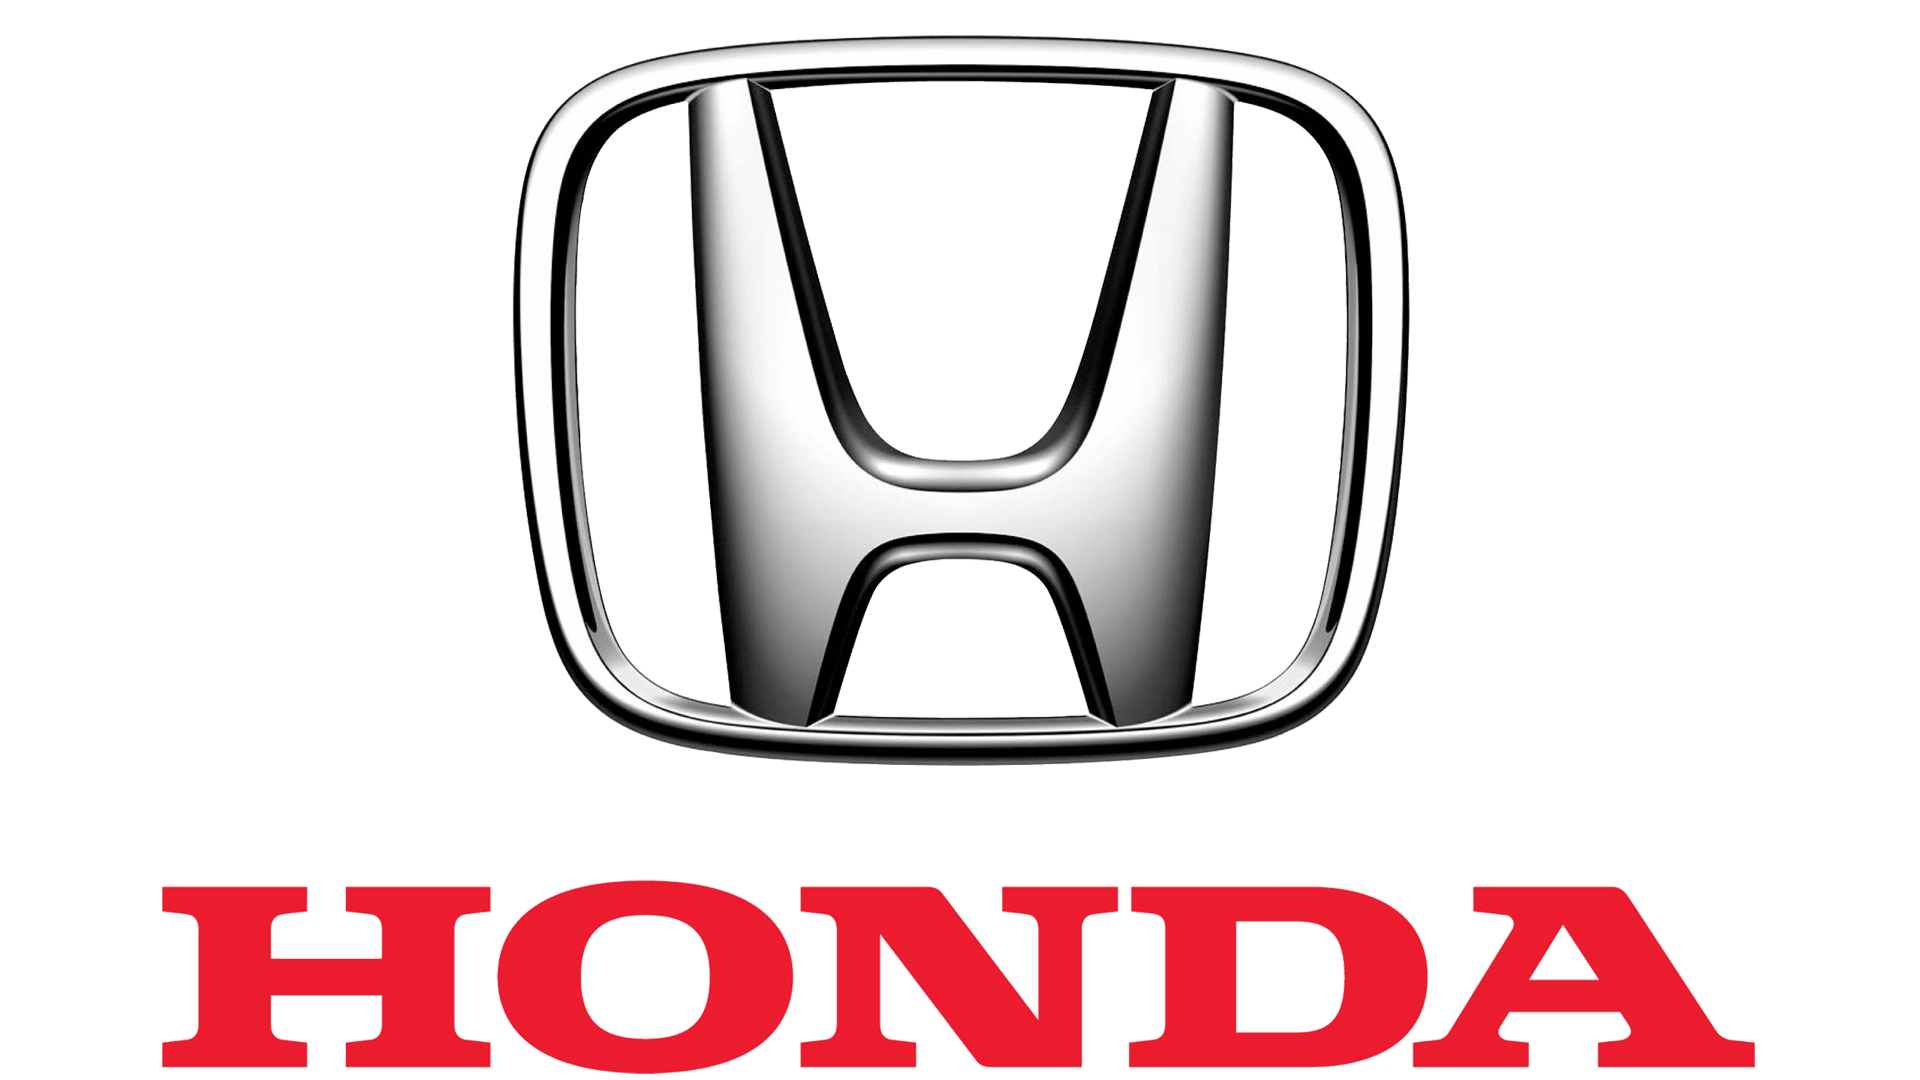 http://rpmautolease.com/wp-content/uploads/2017/08/Honda-logo-1920x1080.png